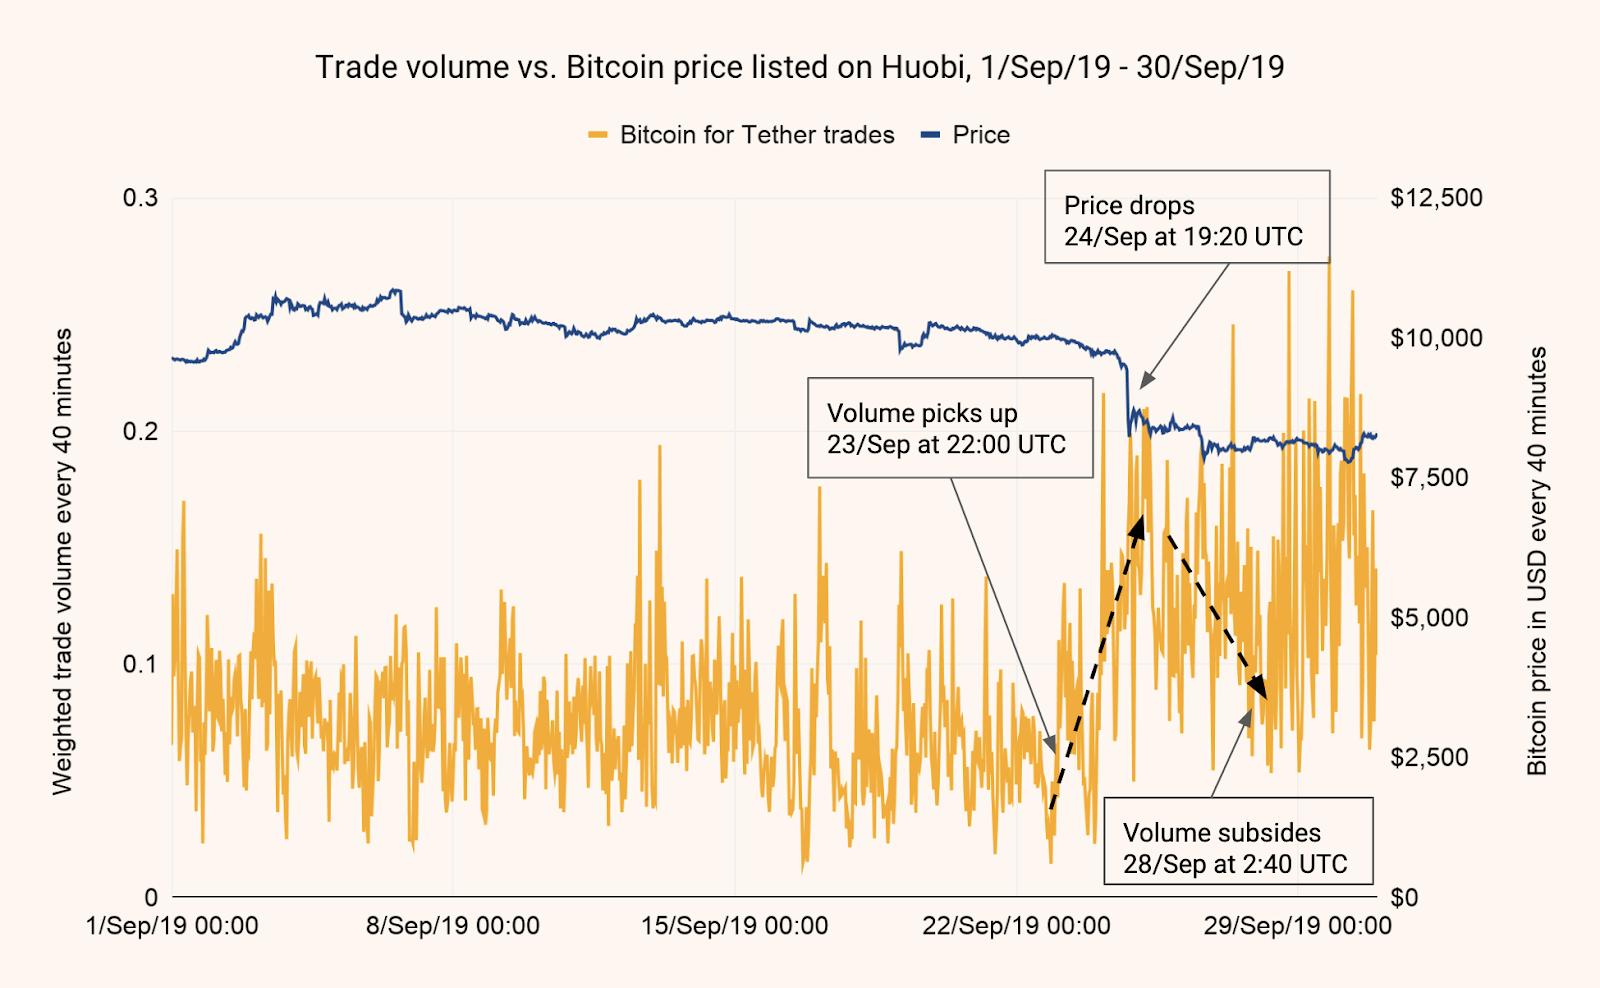 "Los retiros de Plustoken podrían estar detrás de la caída de precios de BTC, dice el informe ""width ="" 1600 ""height ="" 988 ""srcset = ""https://blackswanfinances.com/wp-content/uploads/2019/12/5dee8bb62a7c971cc479b778_no3sv5puw-b05xxpa9dhvkl5fp1bx2umxc2hntrgm6bu-fg6ndwtbzvtddfy8gfymiokbkkzrd-lsshzctg1h9t0rwzxztkpliwqrlkeiiglleqjg2m_bseror01ykvik1iencju.png 1600w, https://news.bitcoin.com/wp-content/uploads/2019 /12/5dee8bb62a7c971cc479b778_no3sv5puw-b05xxpa9dhvkl5fp1bx2umxc2hntrgm6bu-fg6ndwtbzvtddfy8gfymiokbkkzrd-lsshzctg1h9t0rwzxztkpliwqrlkeiiglleqjg2m_bseror01ykvik1iencju-300x185.png 300w, 1024w https://news.bitcoin.com/wp-content/uploads/2019/12/5dee8bb62a7c971cc479b778_no3sv5puw-b05xxpa9dhvkl5fp1bx2umxc2hntrgm6bu-fg6ndwtbzvtddfy8gfymiokbkkzrd-lsshzctg1h9t0rwzxztkpliwqrlkeiiglleqjg2m_bseror01ykvik1iencju-1024x632.png, https : //news.bitcoin.com/wp-content/uploads/2019/12/5dee8bb62a7c971cc479b778_no3 sv5puw-b05xxpa9dhvkl5fp1bx2umxc2hntrgm6bu-fg6ndwtbzvtddfy8gfymiokbkkzrd-lsshzctg1h9t0rwzxztkpliwqrlkeiiglleqjg2m_bseror01ykvik1iencju-768x474.png 768w, 1536w https://news.bitcoin.com/wp-content/uploads/2019/12/5dee8bb62a7c971cc479b778_no3sv5puw-b05xxpa9dhvkl5fp1bx2umxc2hntrgm6bu-fg6ndwtbzvtddfy8gfymiokbkkzrd-lsshzctg1h9t0rwzxztkpliwqrlkeiiglleqjg2m_bseror01ykvik1iencju-1536x948.png, https: // news.bitcoin.com/wp-content/uploads/2019/12/5dee8bb62a7c971cc479b778_no3sv5puw-b05xxpa9dhvkl5fp1bx2umxc2hntrgm6bu-fg6ndwtbzvtddfy8gfymiokbkkzrd-lsshzctg1h9t0rwzxztkpliwqrlkeiiglleqjg2m_bseror01ykvik1iencju-696x430.png 696w, https://news.bitcoin.com/wp-content/uploads/2019/12/5dee8bb62a7c971cc479b778_no3sv5puw -b05xxpa9dhvkl5fp1bx2umxc2hntrgm6bu-fg6ndwtbzvtddfy8gfymiokbkkzrd-lsshzctg1h9t0rwzxztkpliwqrlkeiiglleqjg2m_bseror01ykvik1iencju-1392x860.png 1392w, https://news.bitcoin.com/wp-content/uploads/2019/12/5dee8bb62a7c971cc479b778_no3sv5puw-b05xxpa9dhvkl5fp1bx2umxc2hntrgm6bu-fg6ndwtbzvtddfy8gfymiokbkk ZRD-lsshzctg1h9t0rwzxztkpliwqrlkeiiglleqjg2m_bseror01ykvik1iencju-1068x659.png 106"